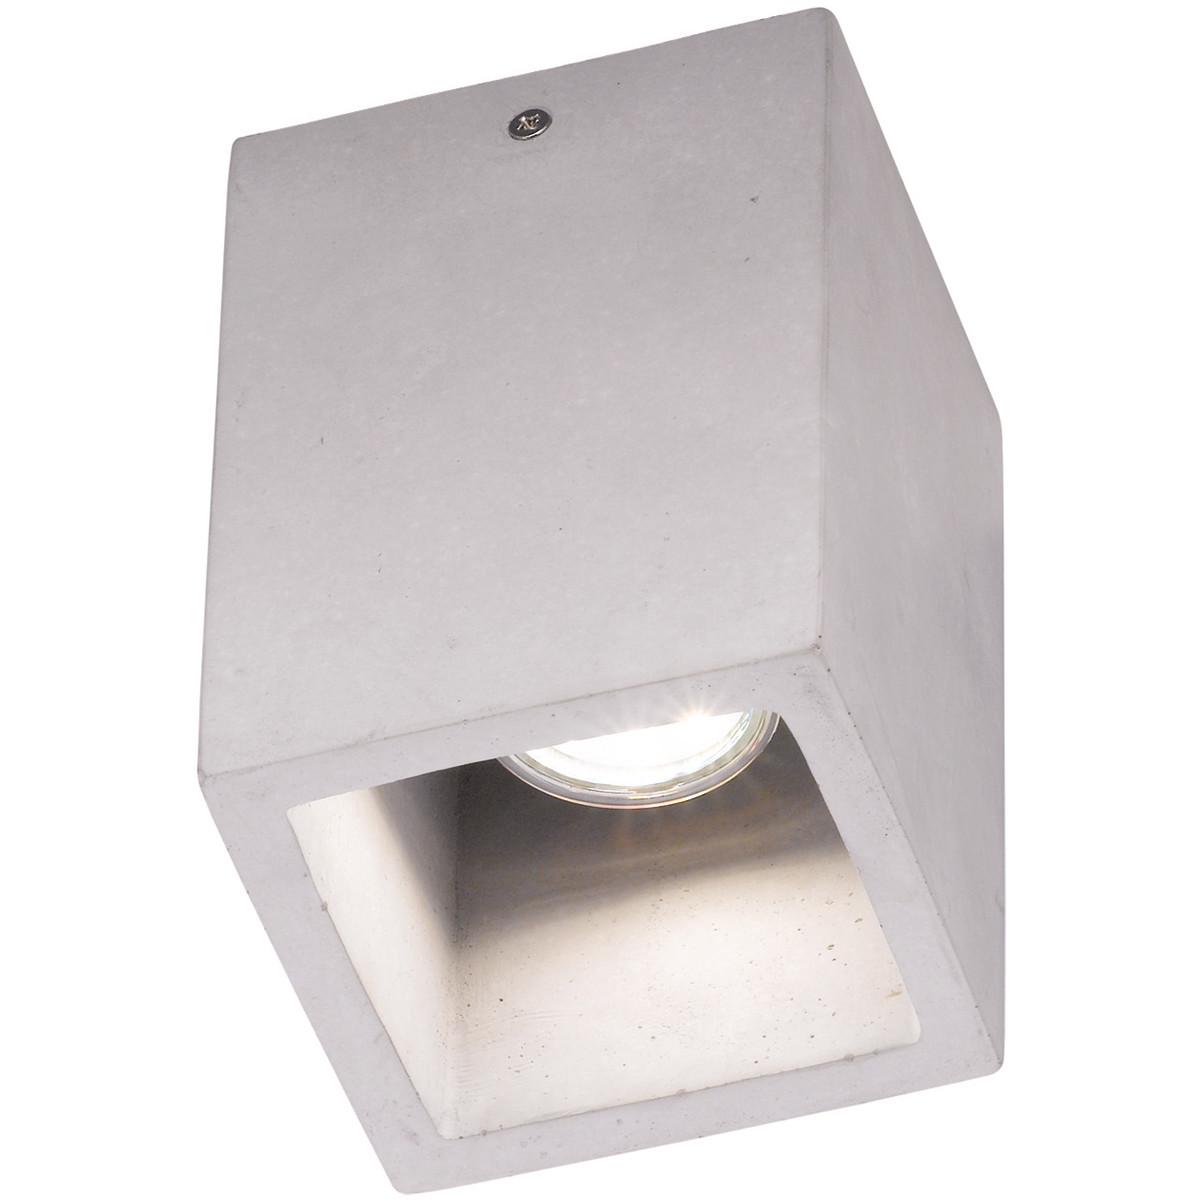 LED Plafondlamp - Plafondverlichting - Trion Cubin - GU10 Fitting - Vierkant - Beton Look - Beton